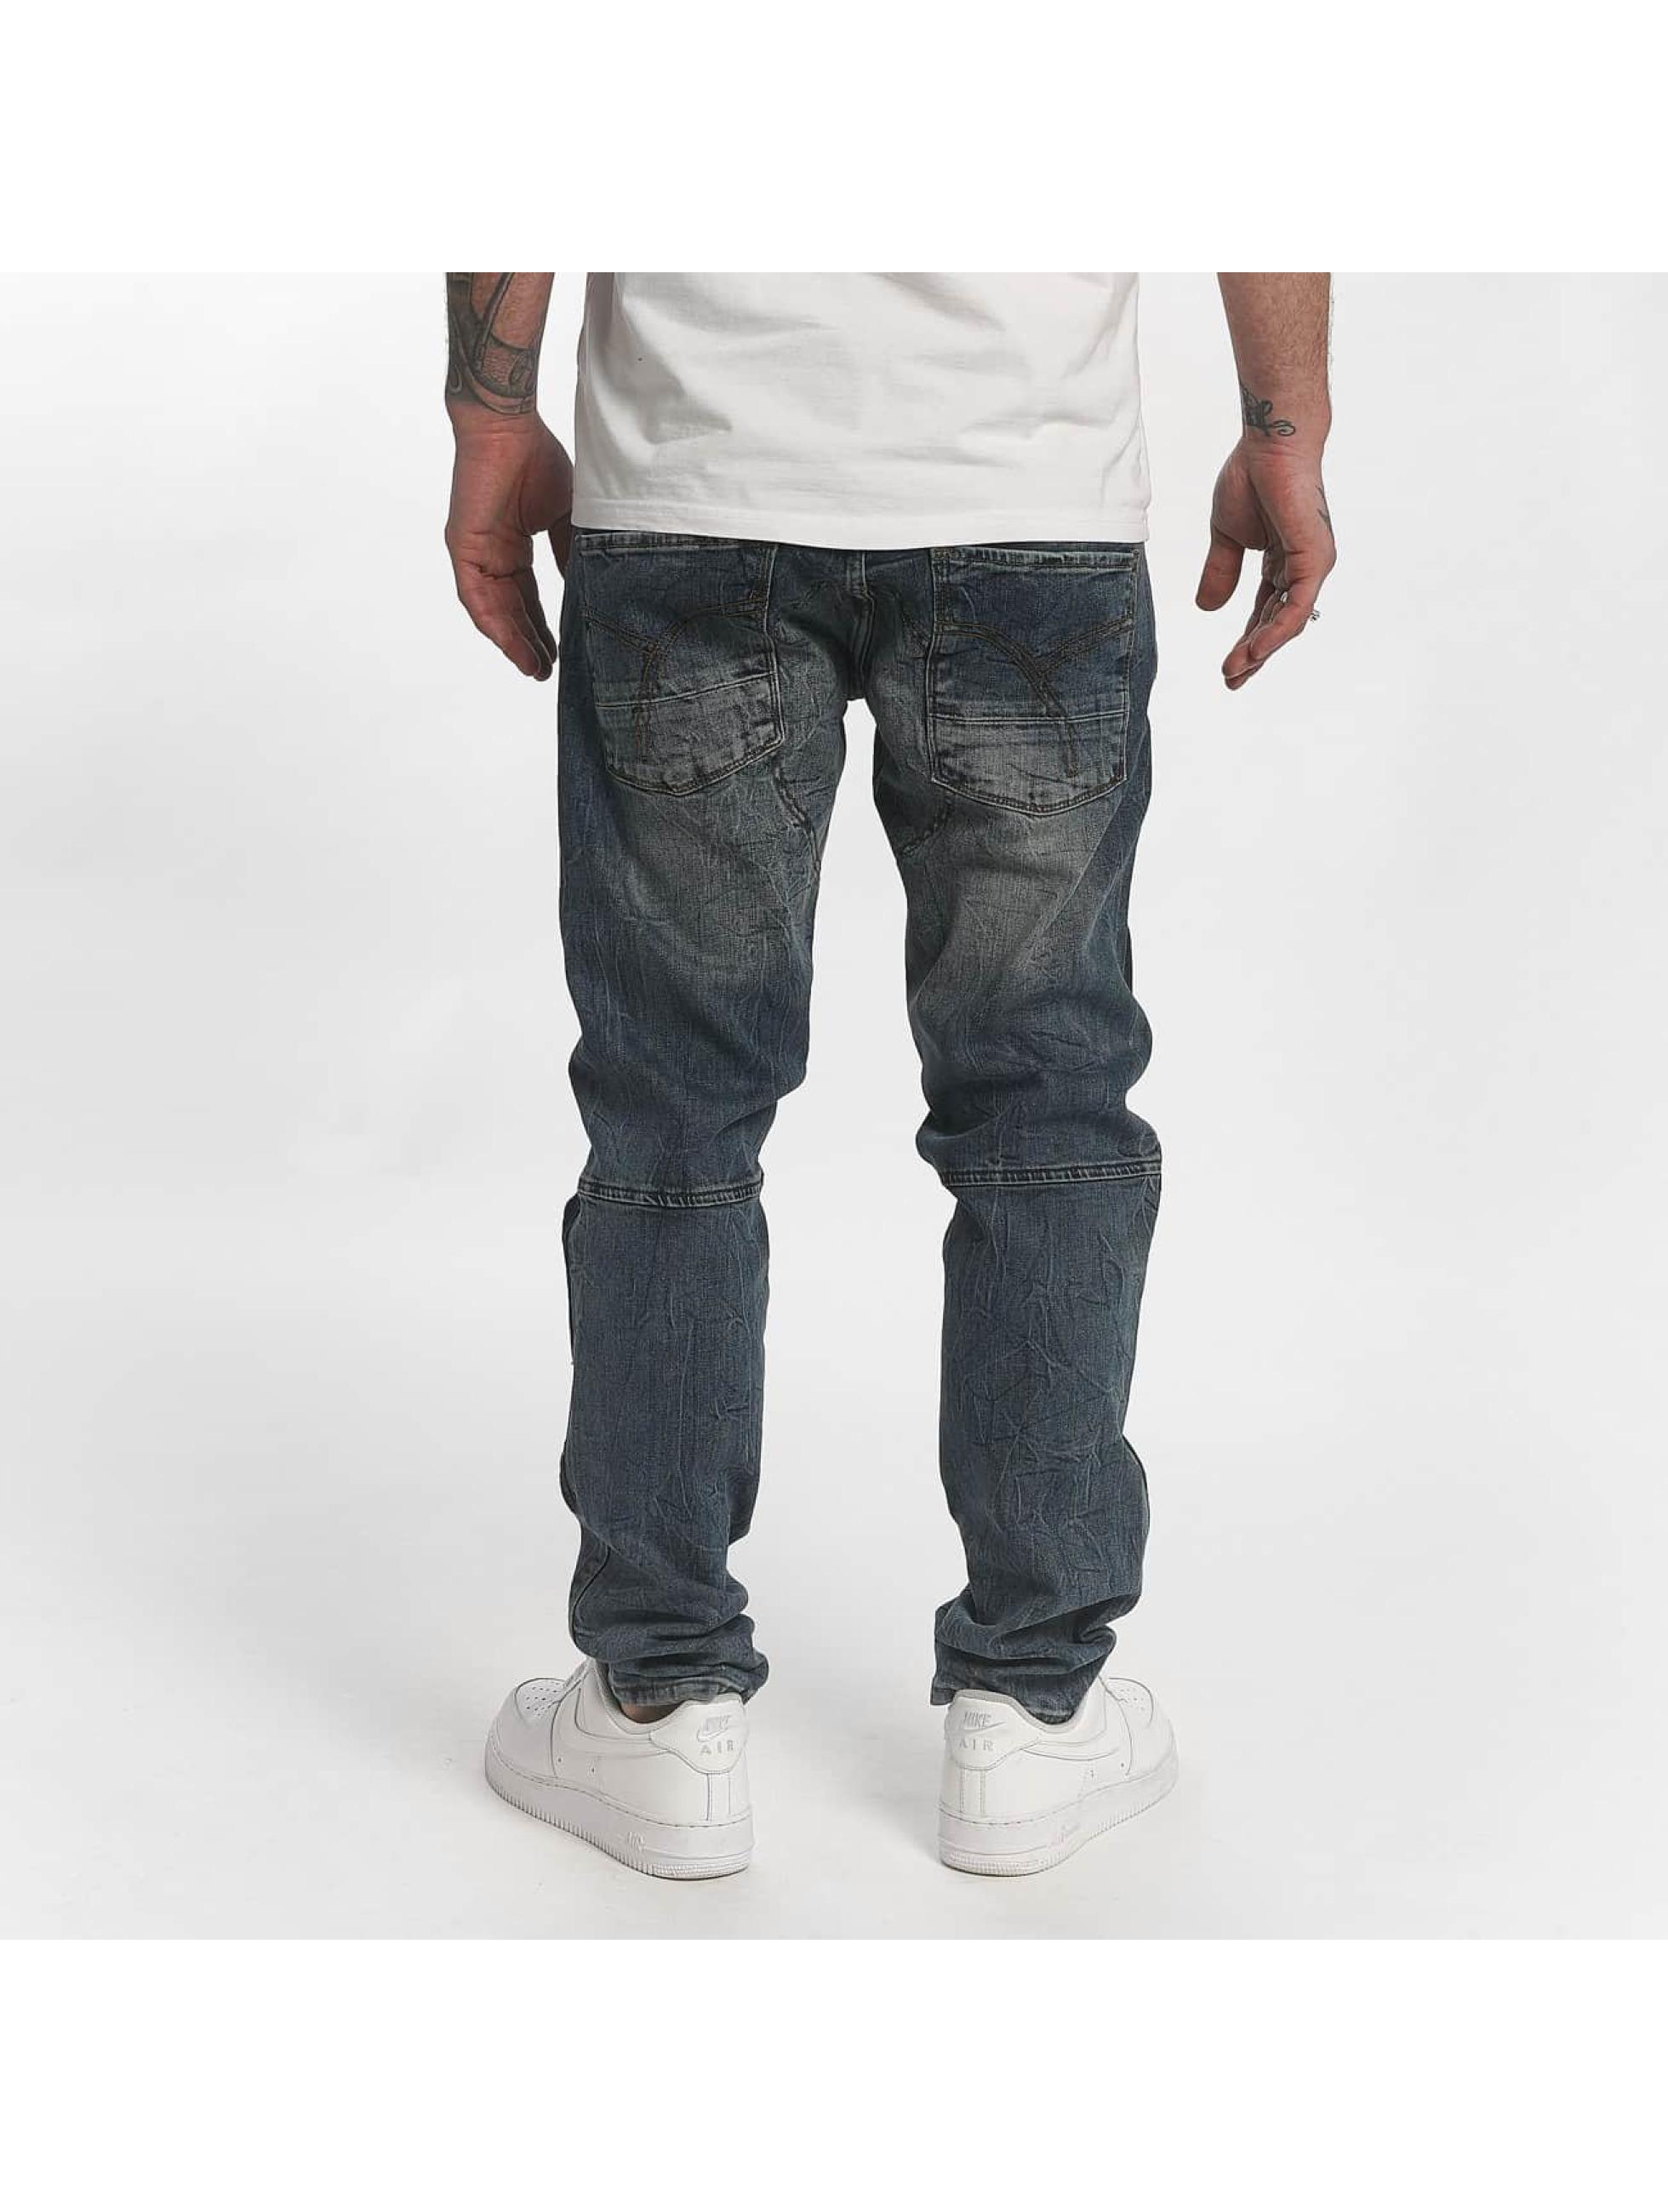 Yakuza Джинсы прямого покроя Straight Fit Jeans индиго